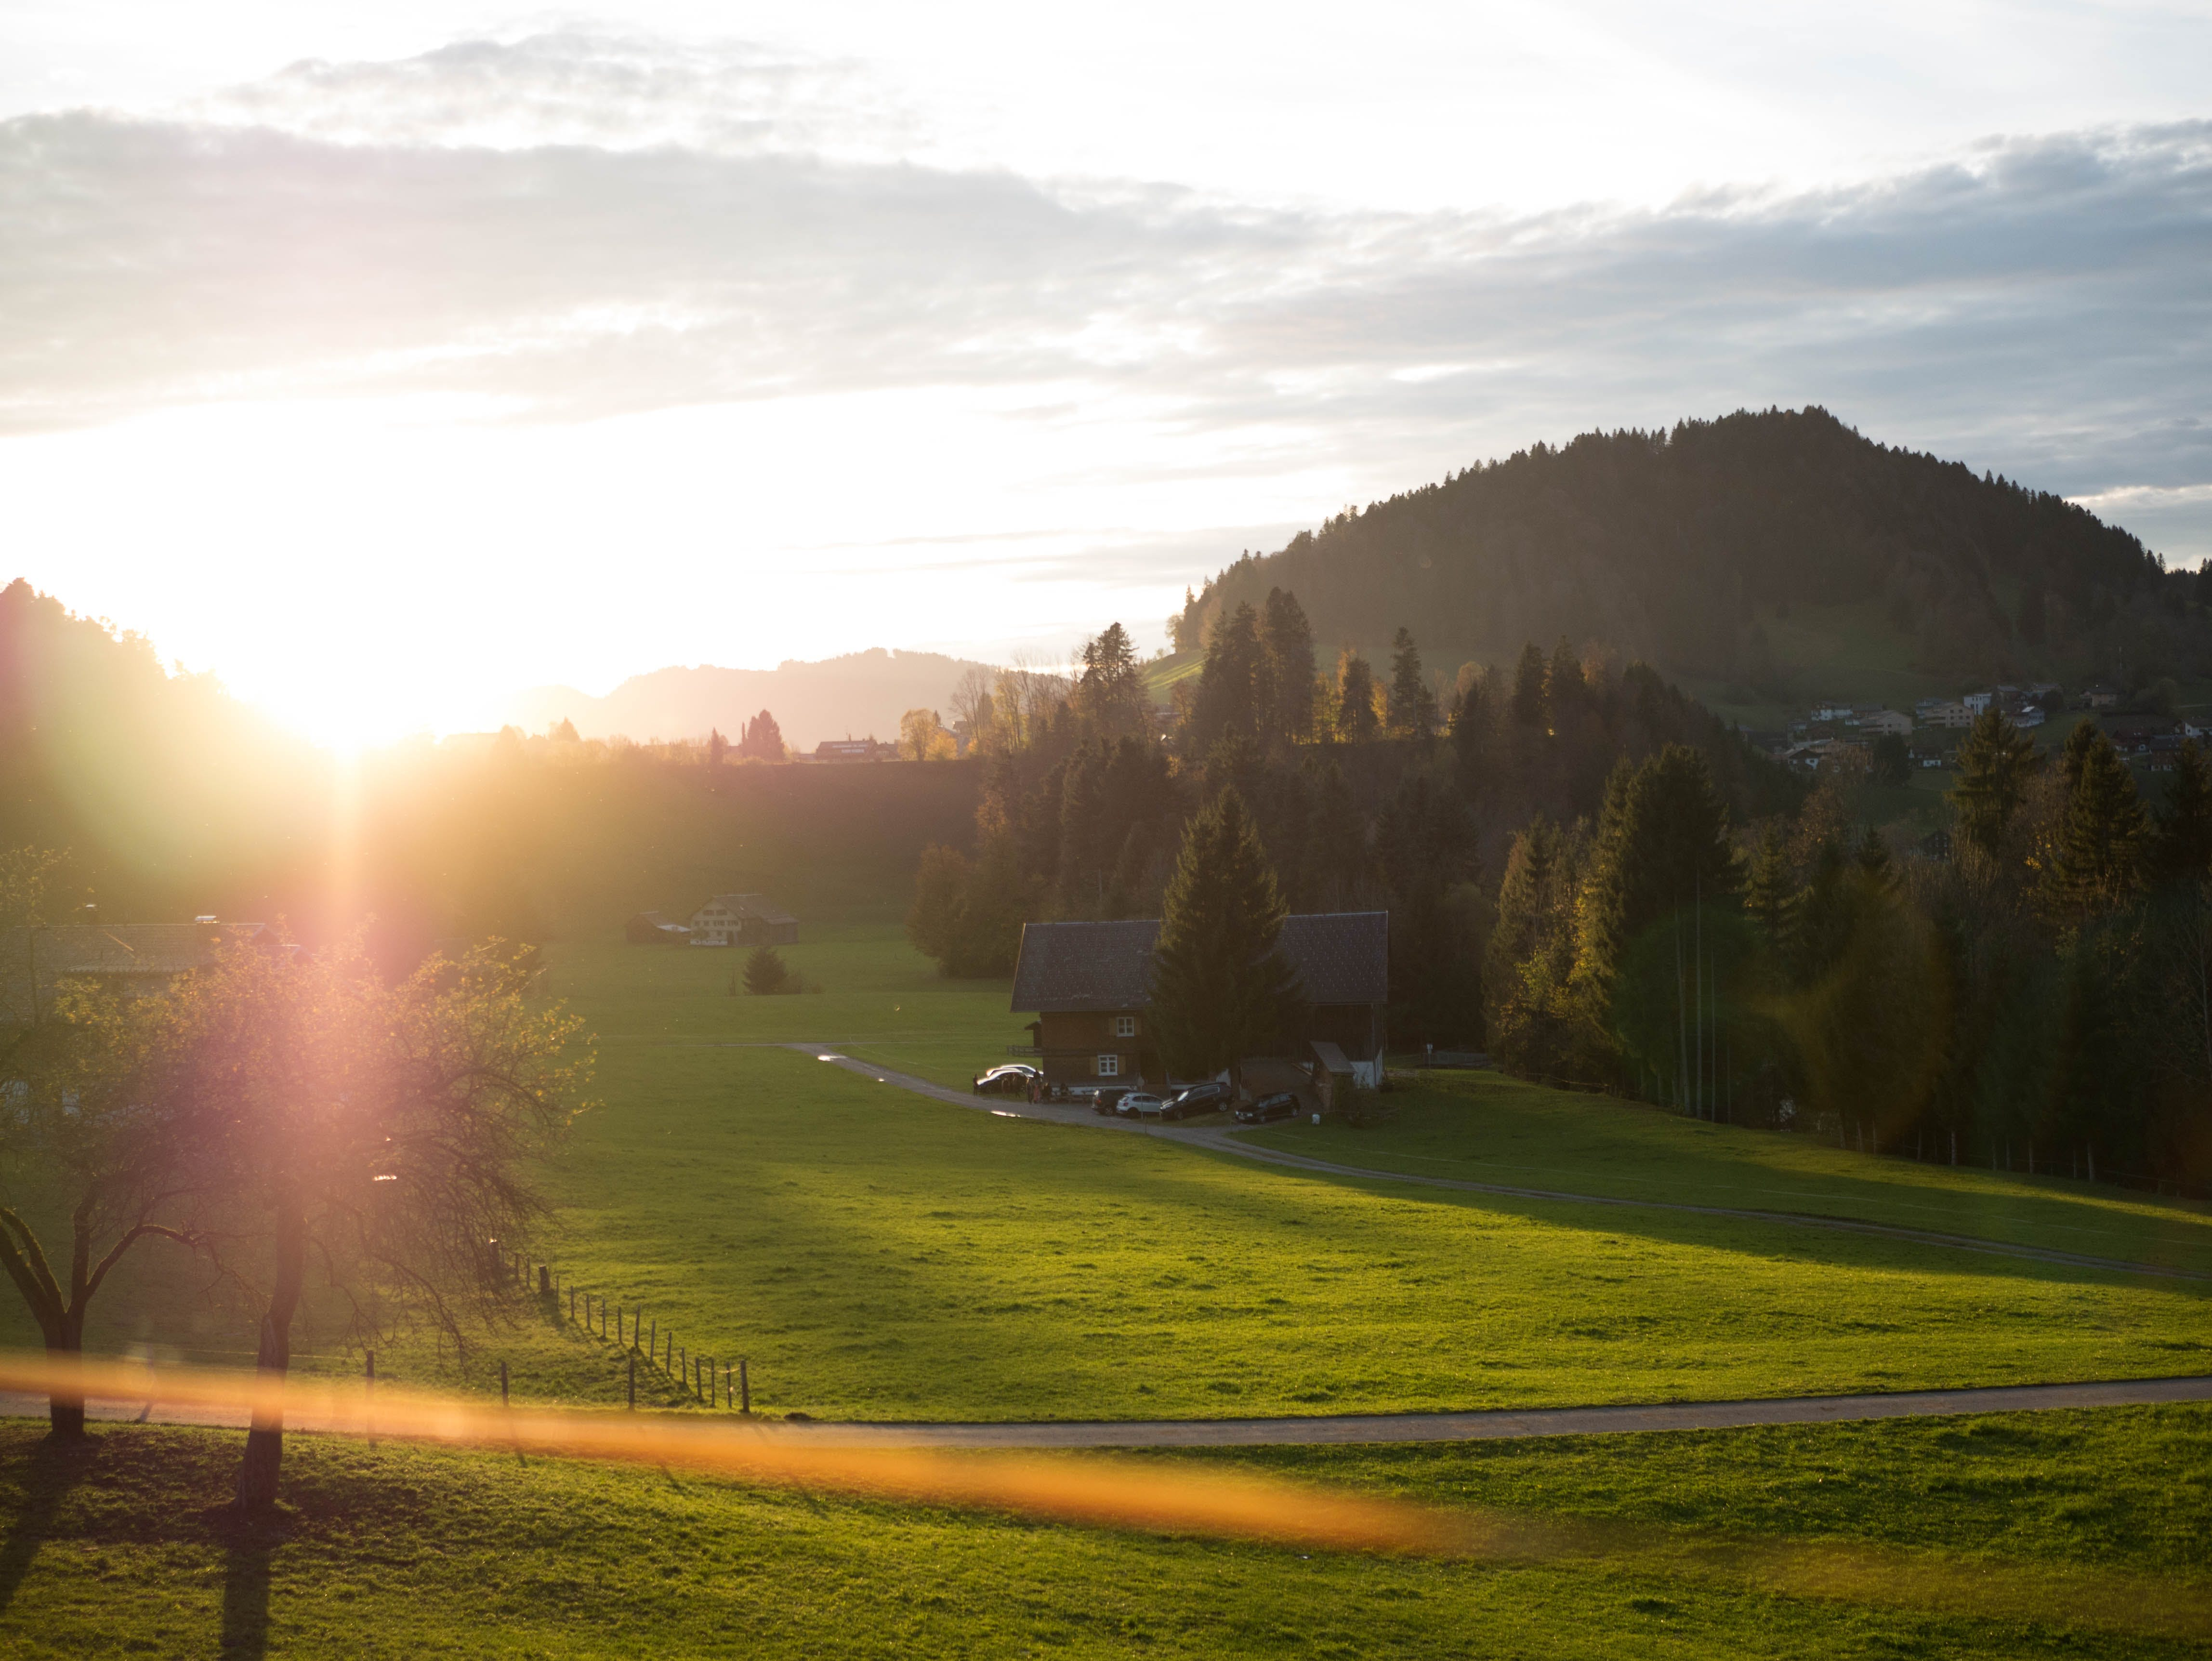 Free stock photo of cars, sunset, mountain, grass